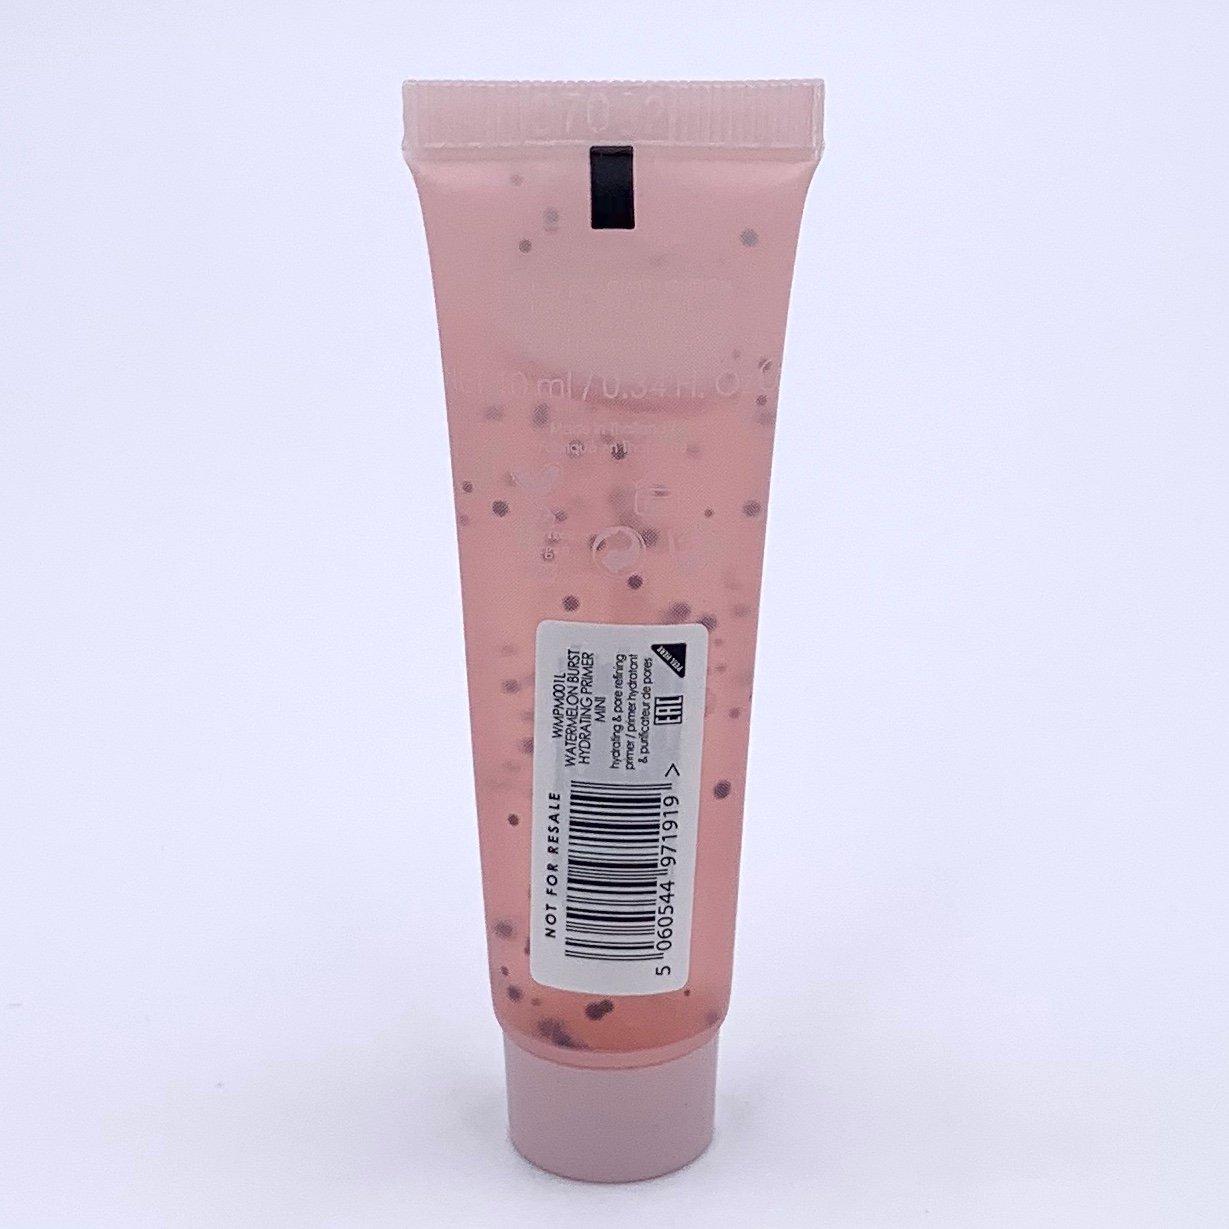 Ciaté London Watermelon Burst Hydrating Primer Back for Ipsy Glam Bag July 2020